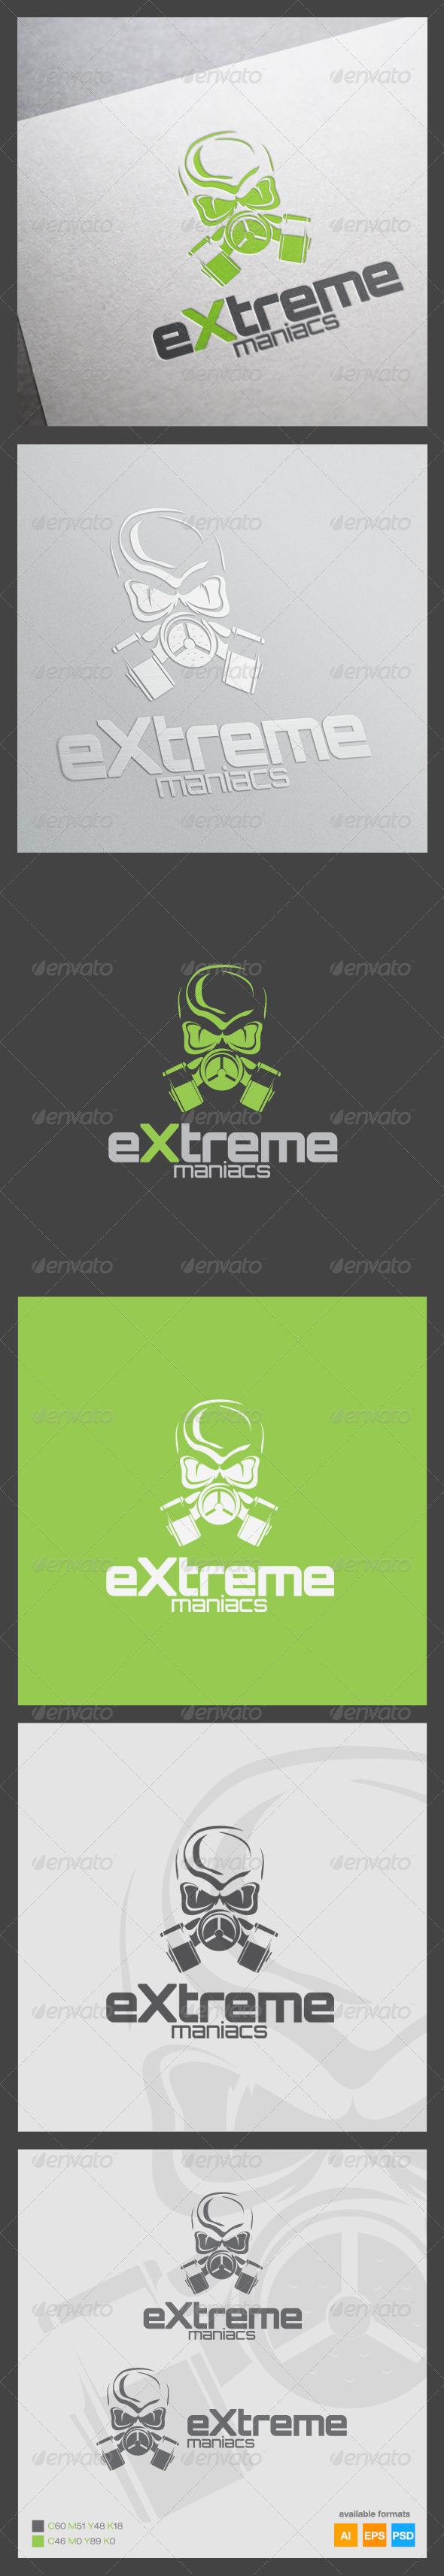 GraphicRiver Extreme Maniacs Logo Template 6266907